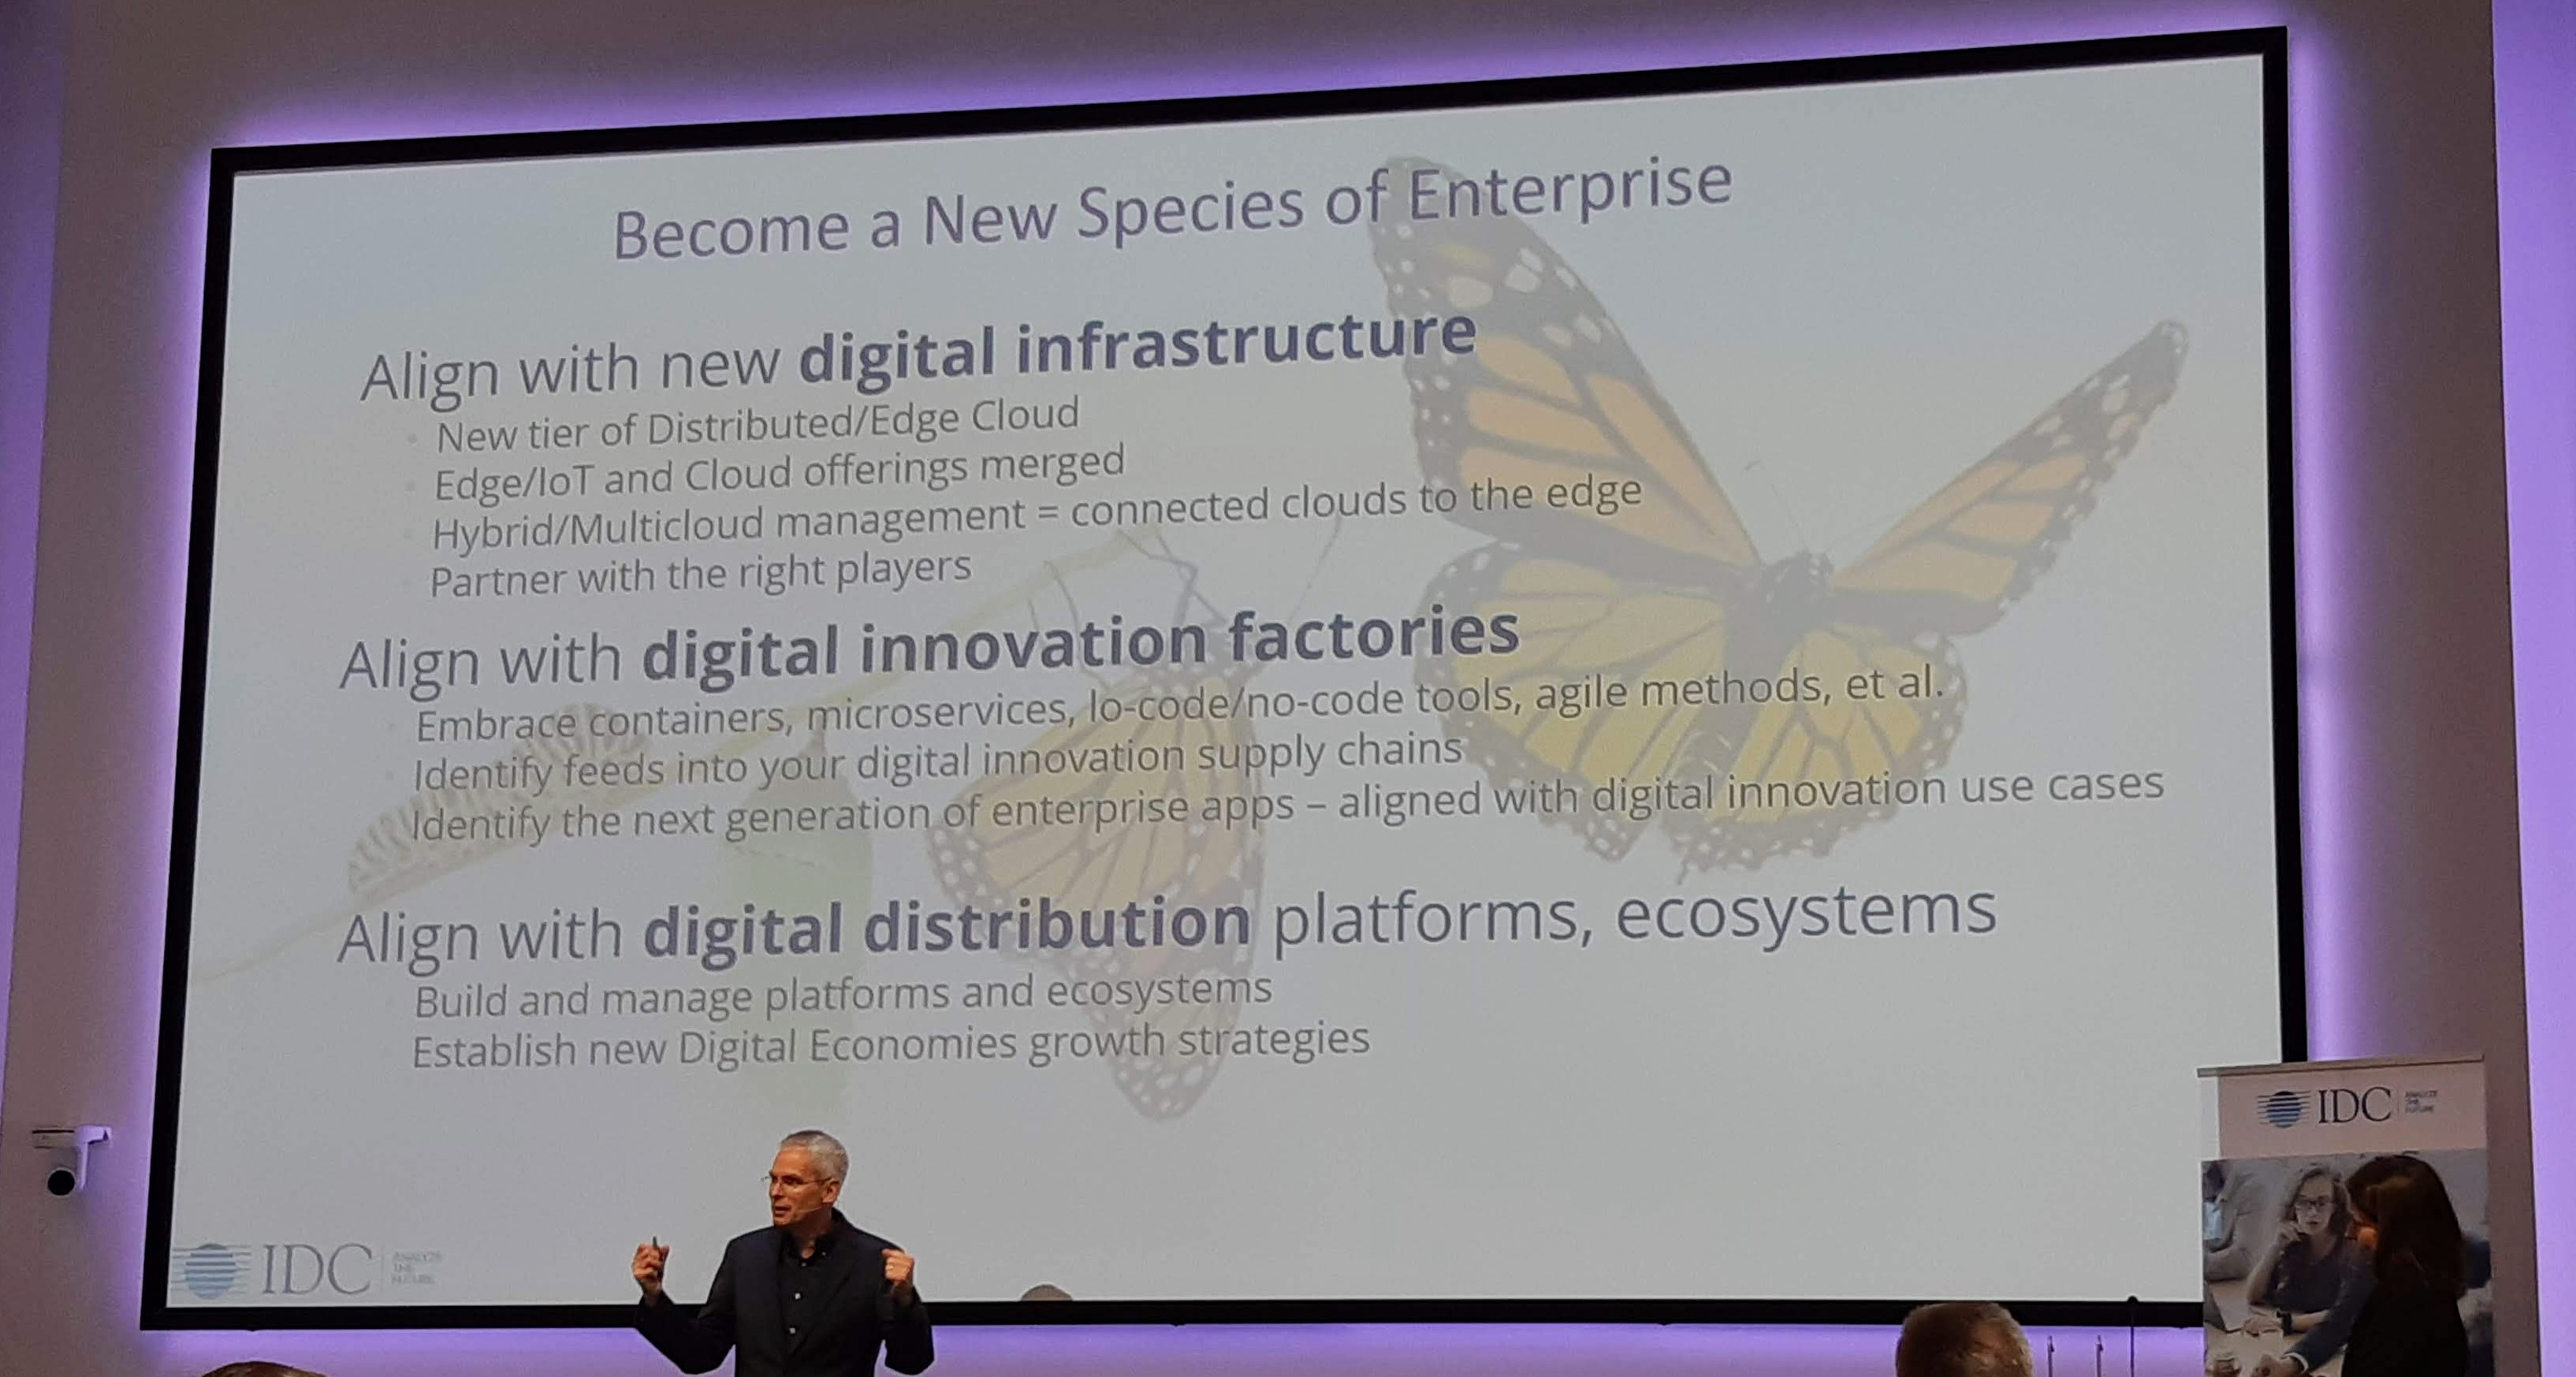 Digital first økonomi at IDC CxO Directions 2020